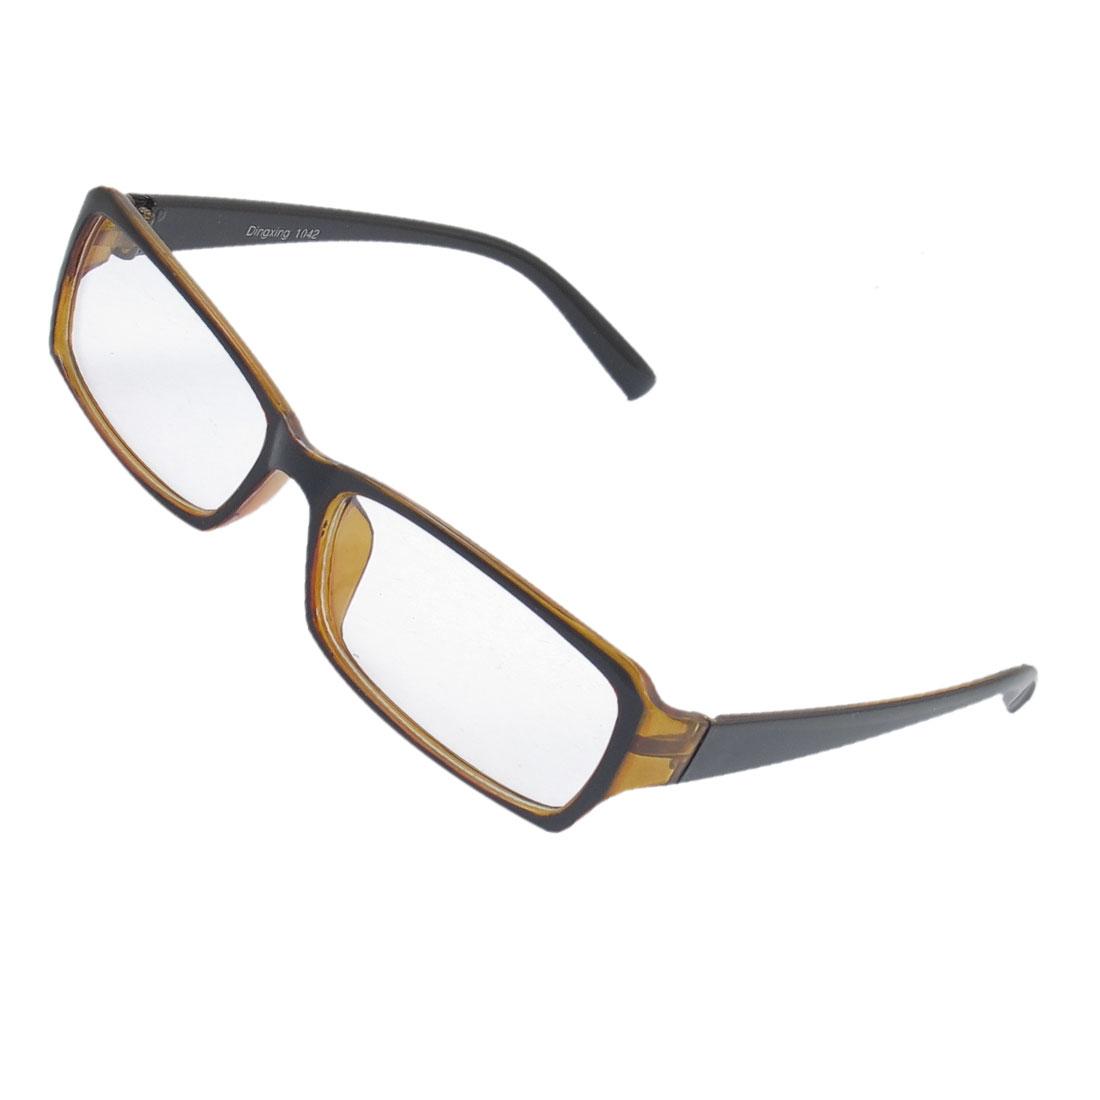 Lady Full Rim Clear Lens Plain Glasses Eyeglass Eyewear Black Brown